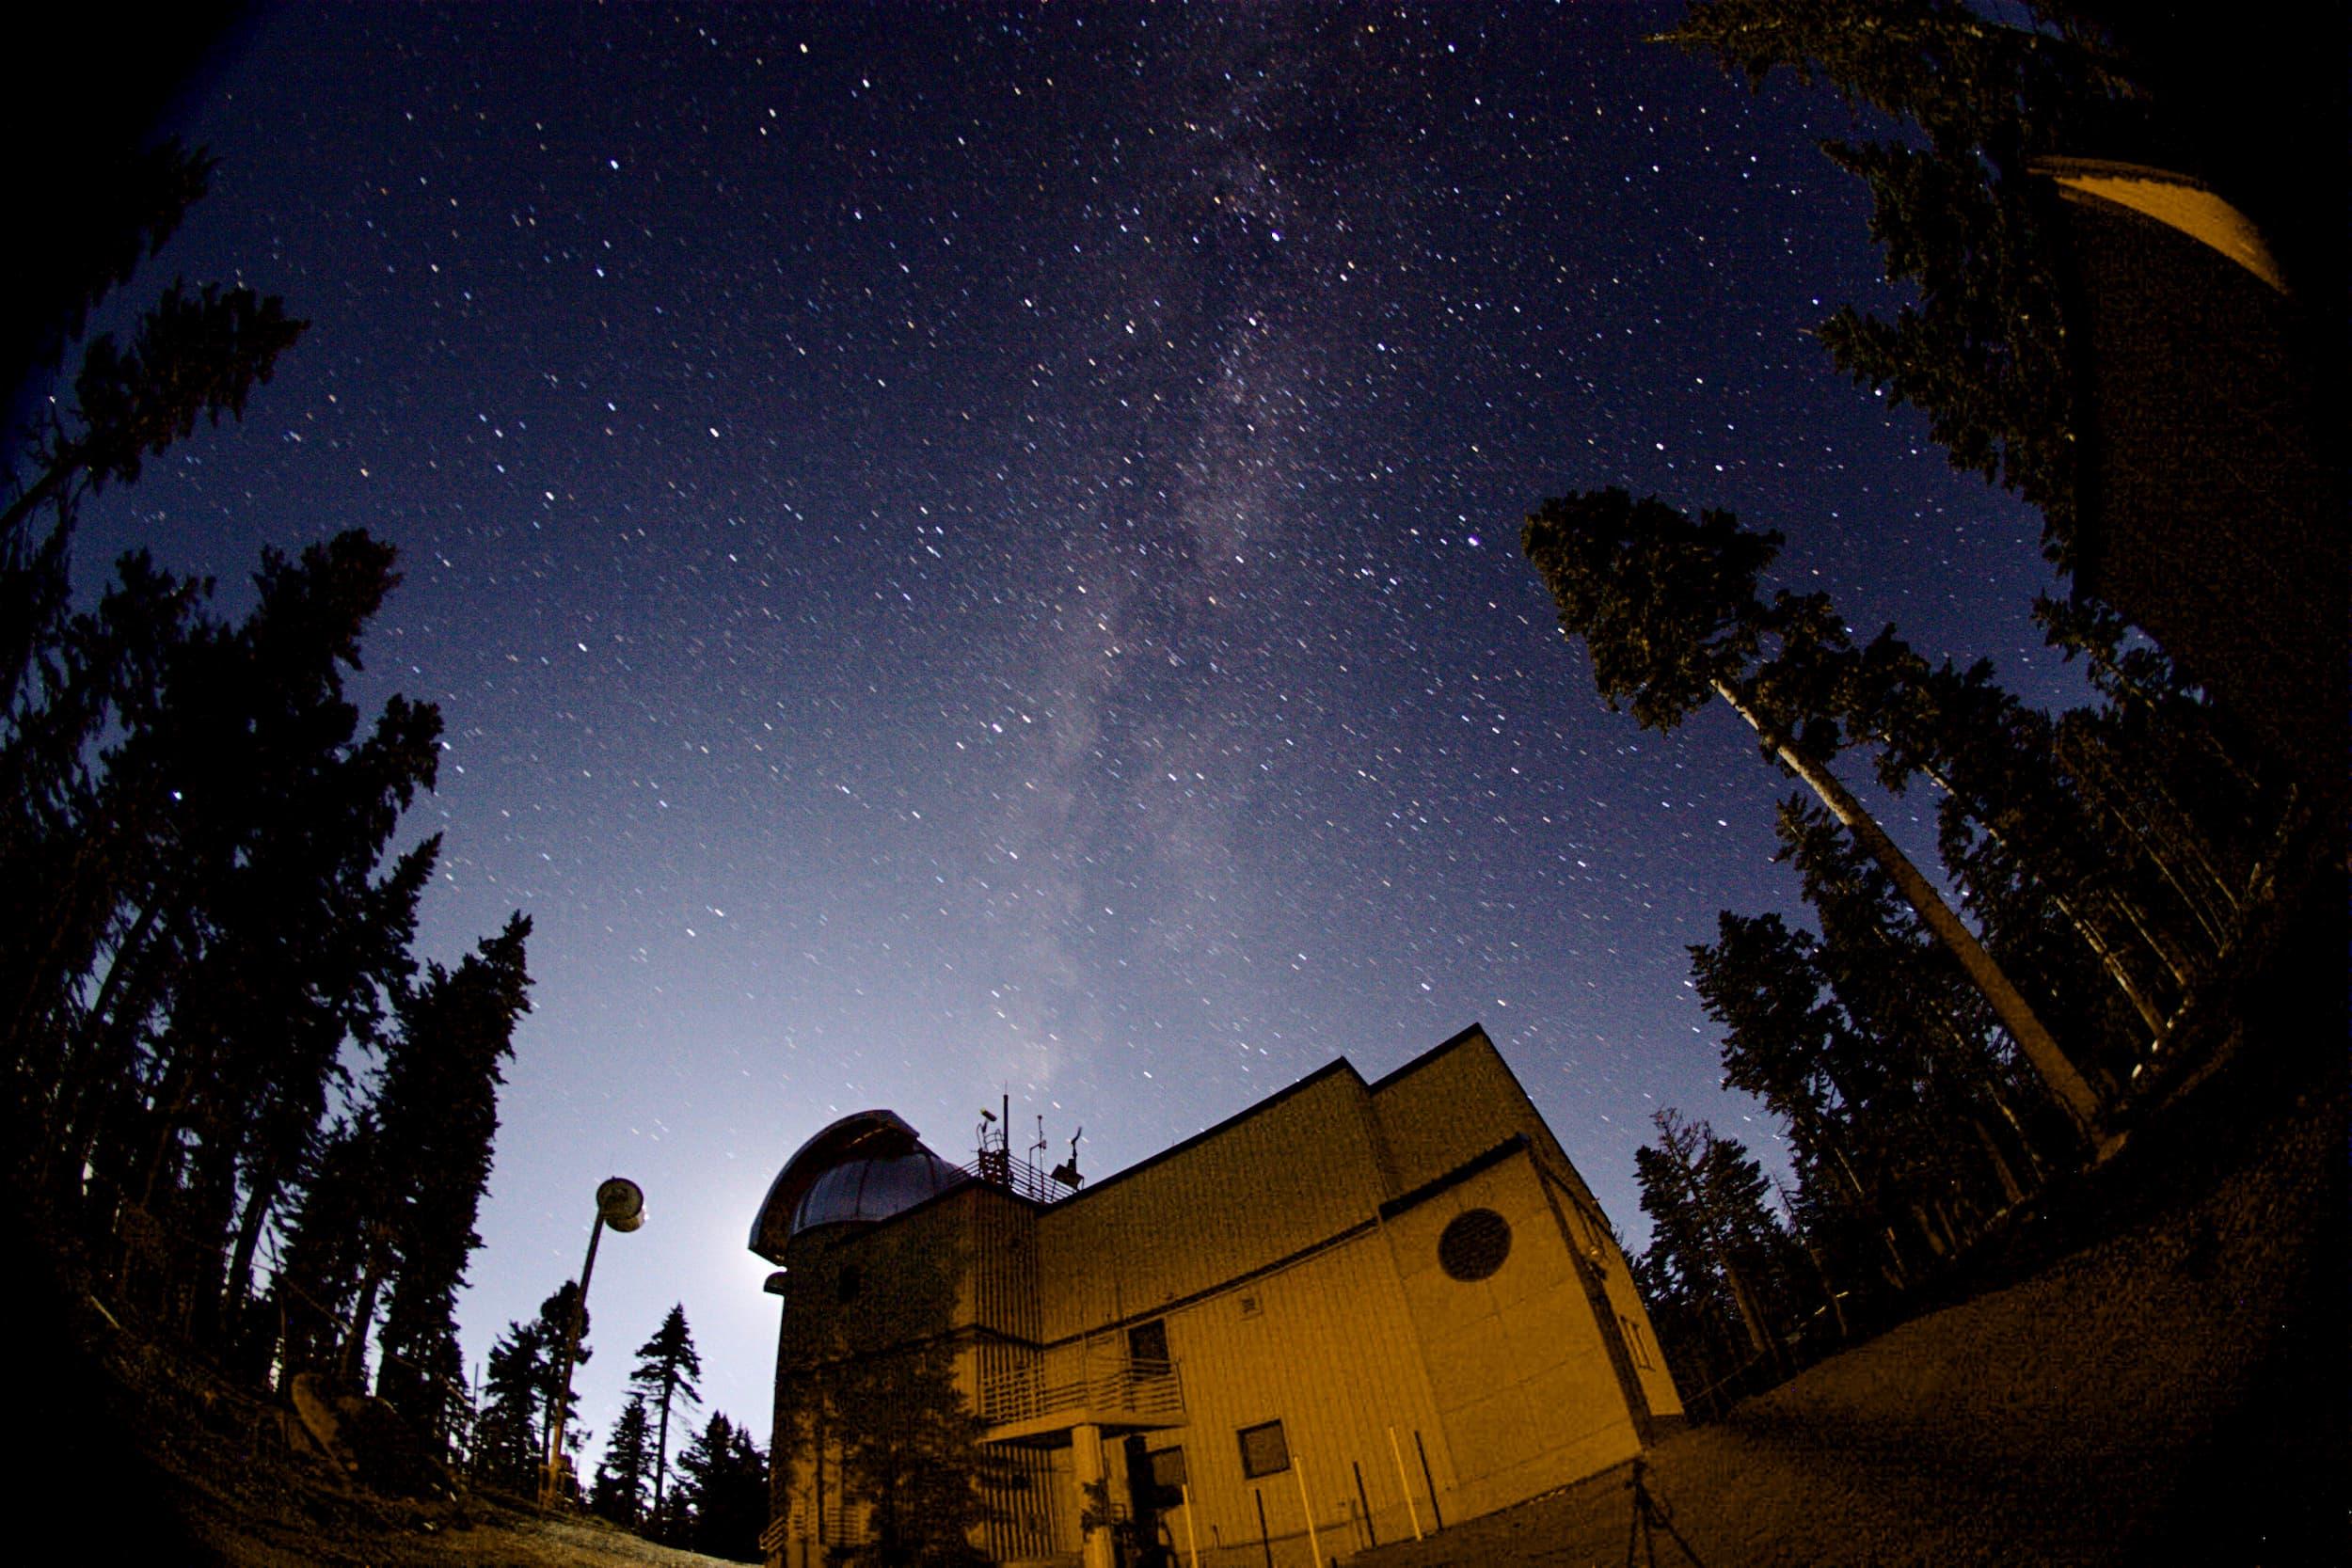 Vatican Advanced Technology Telescope (VATT) at Night